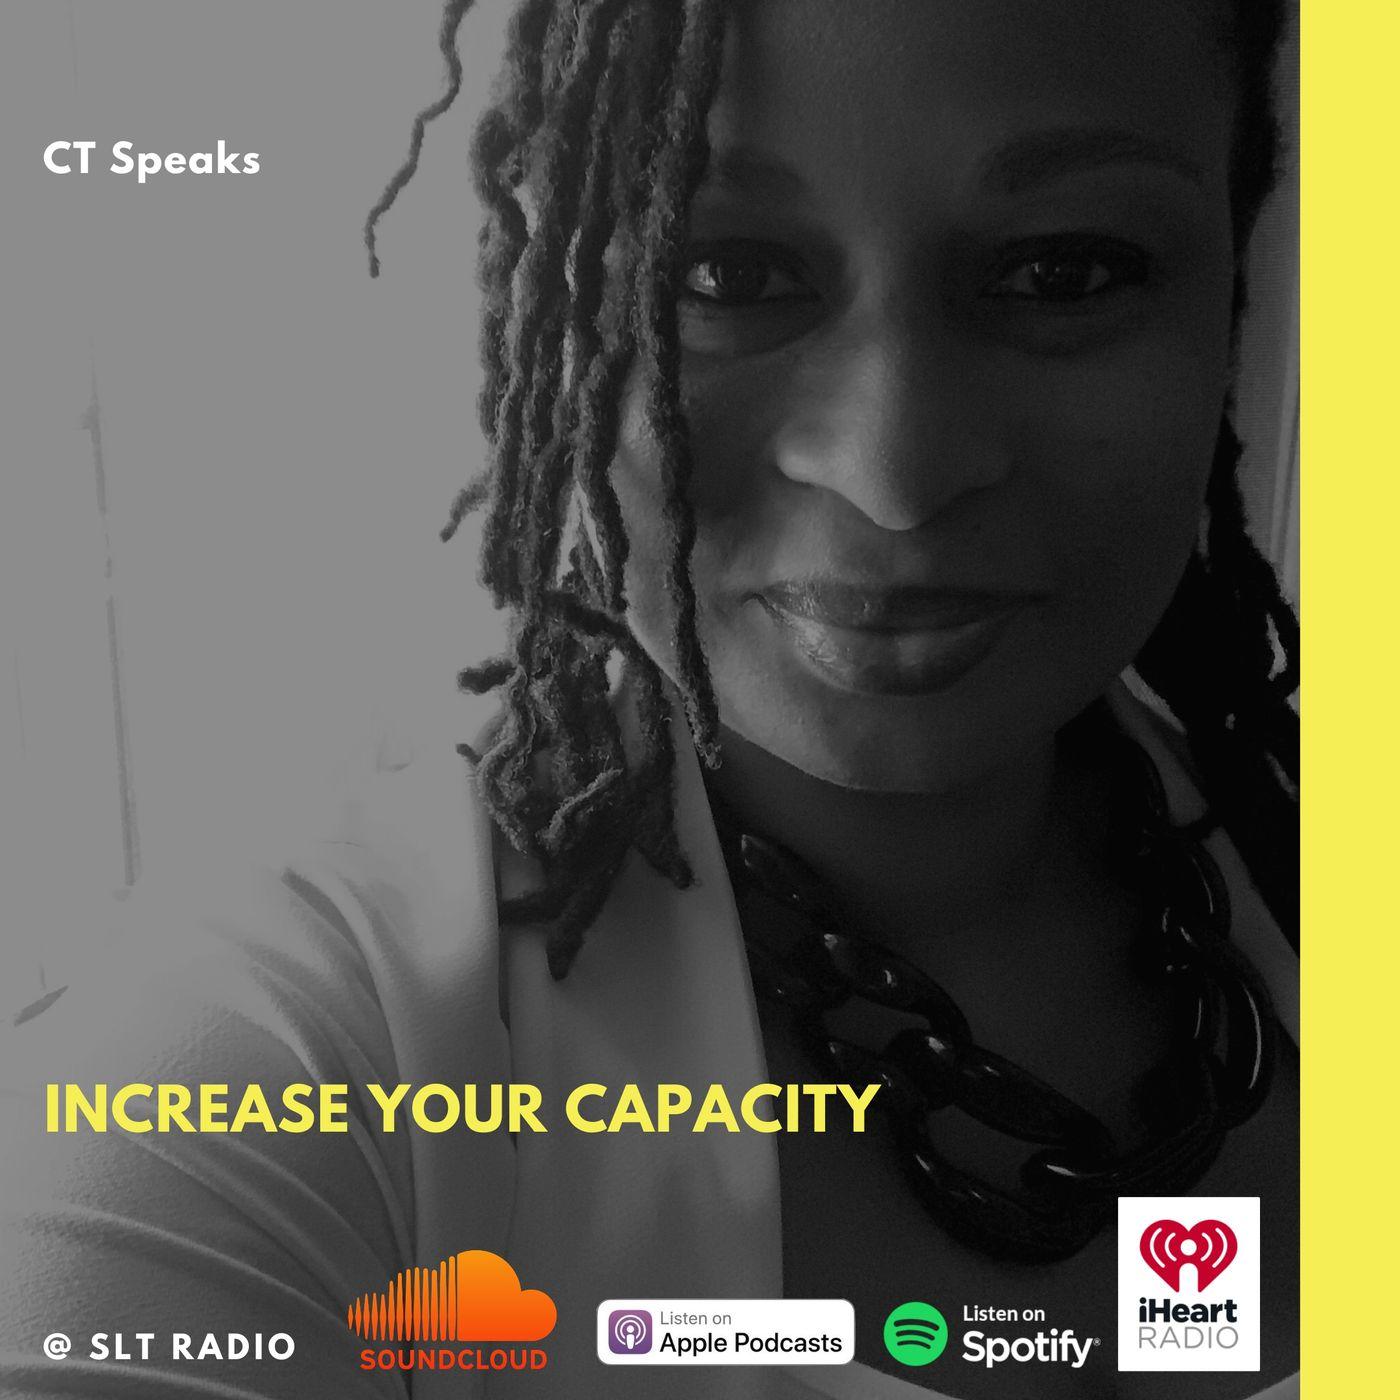 8.11 - GM2Leader - Increase Your Capacity - CT Speaks (Host)